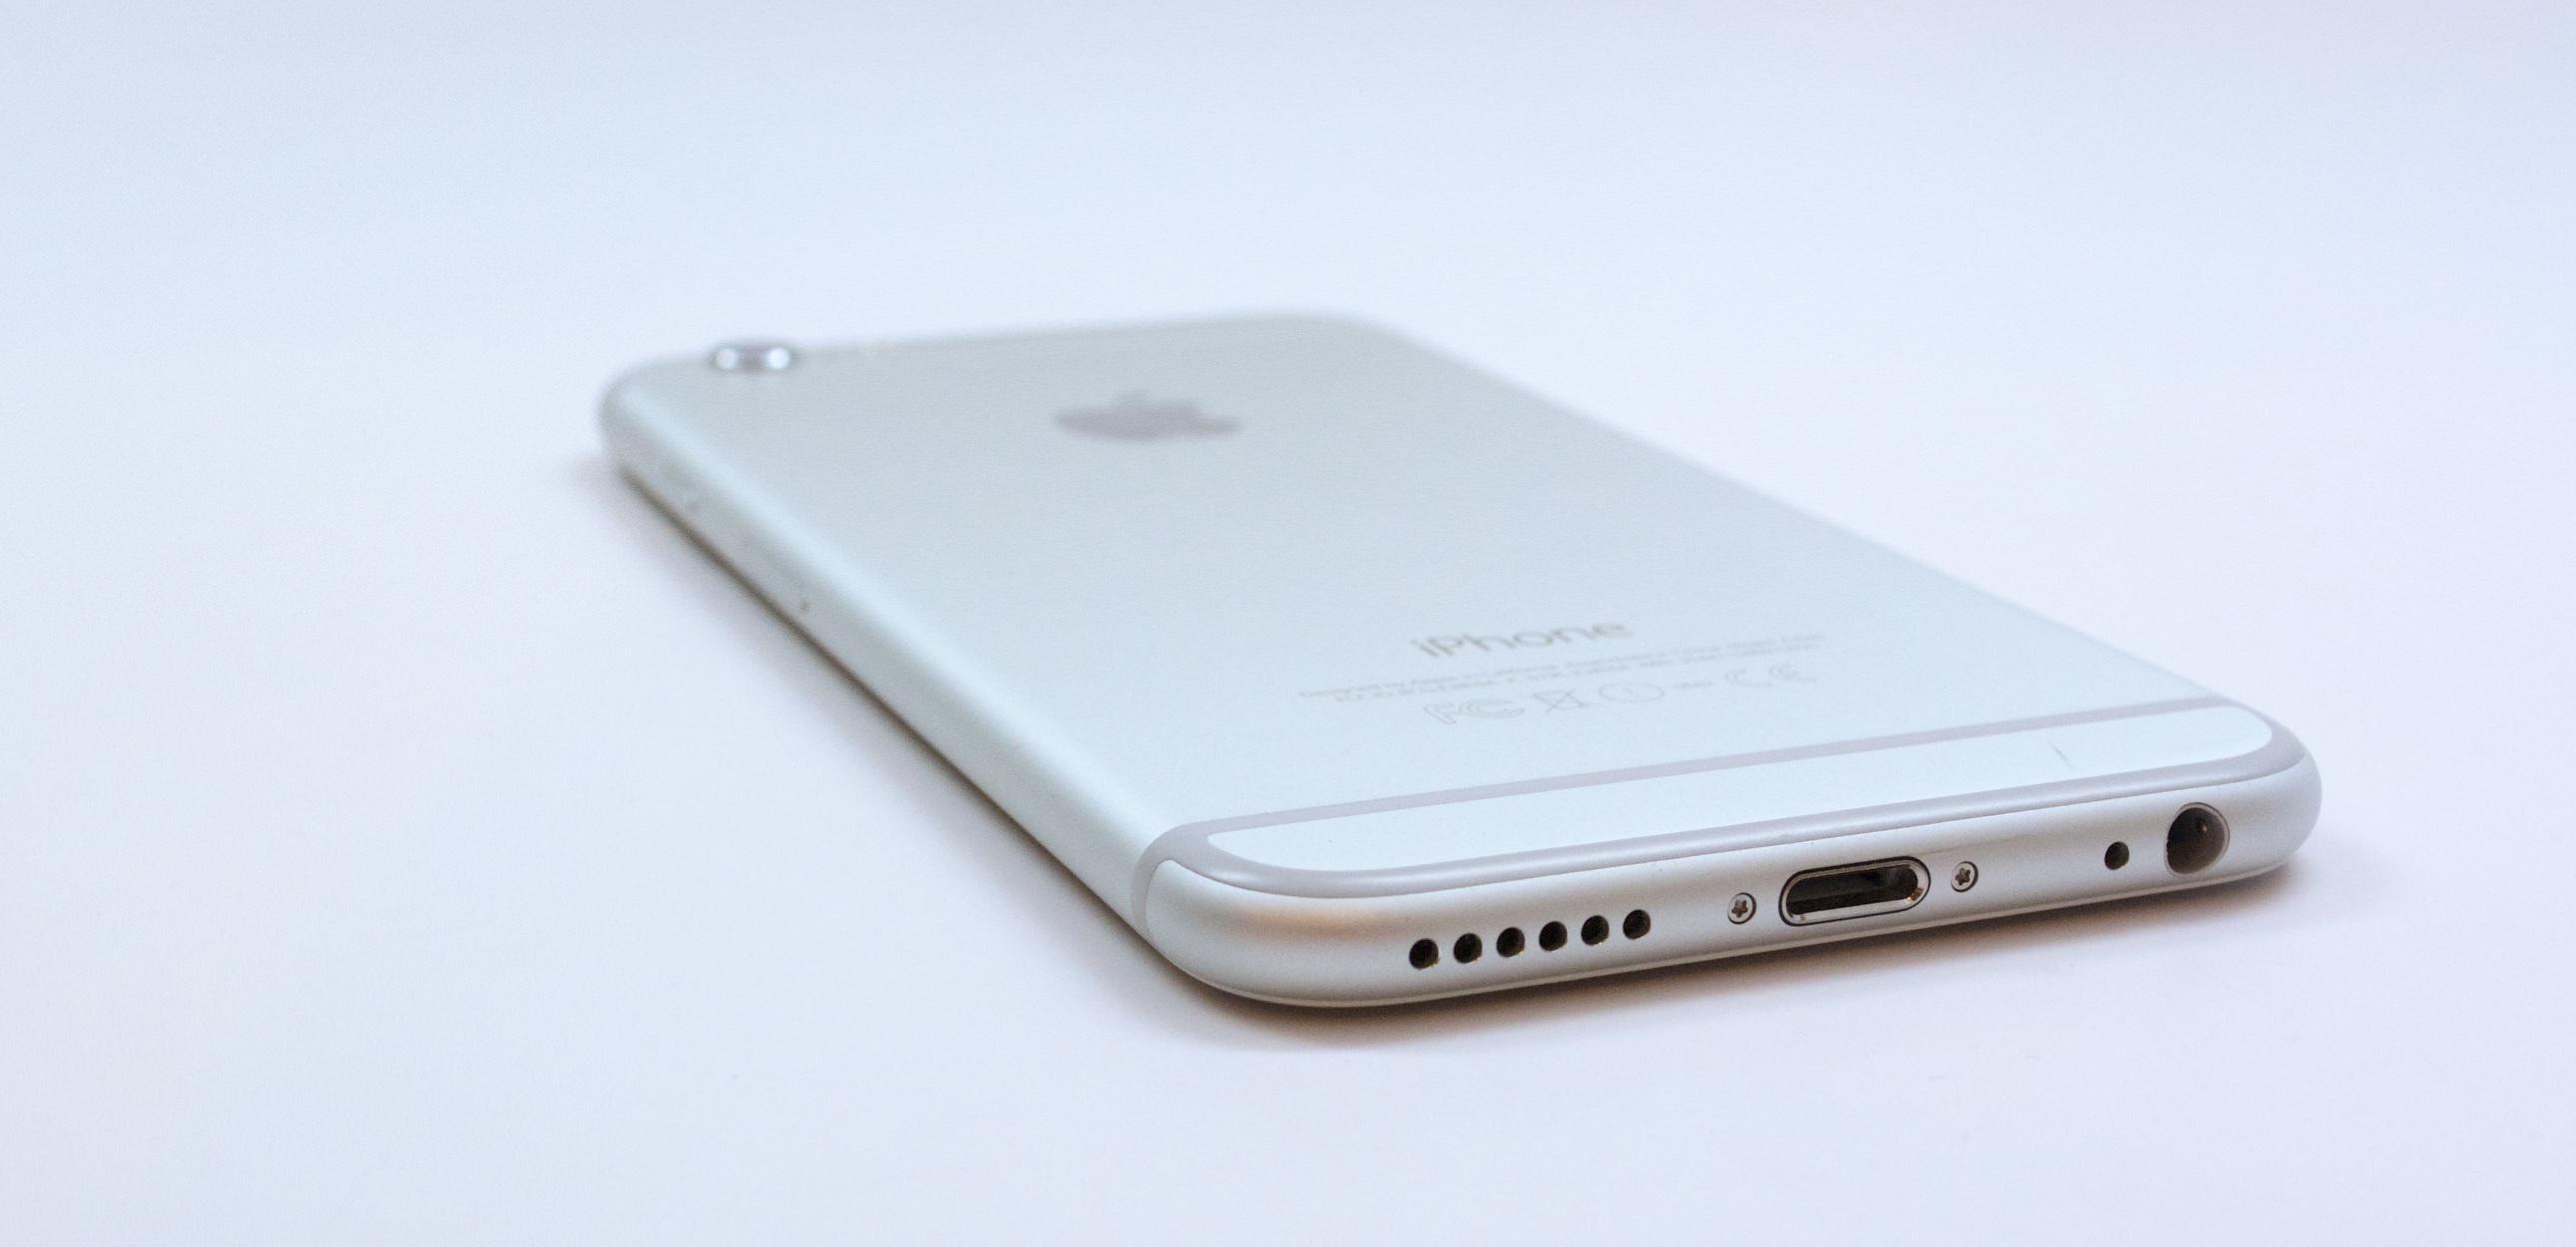 Granskning av iPhone 6 - 5